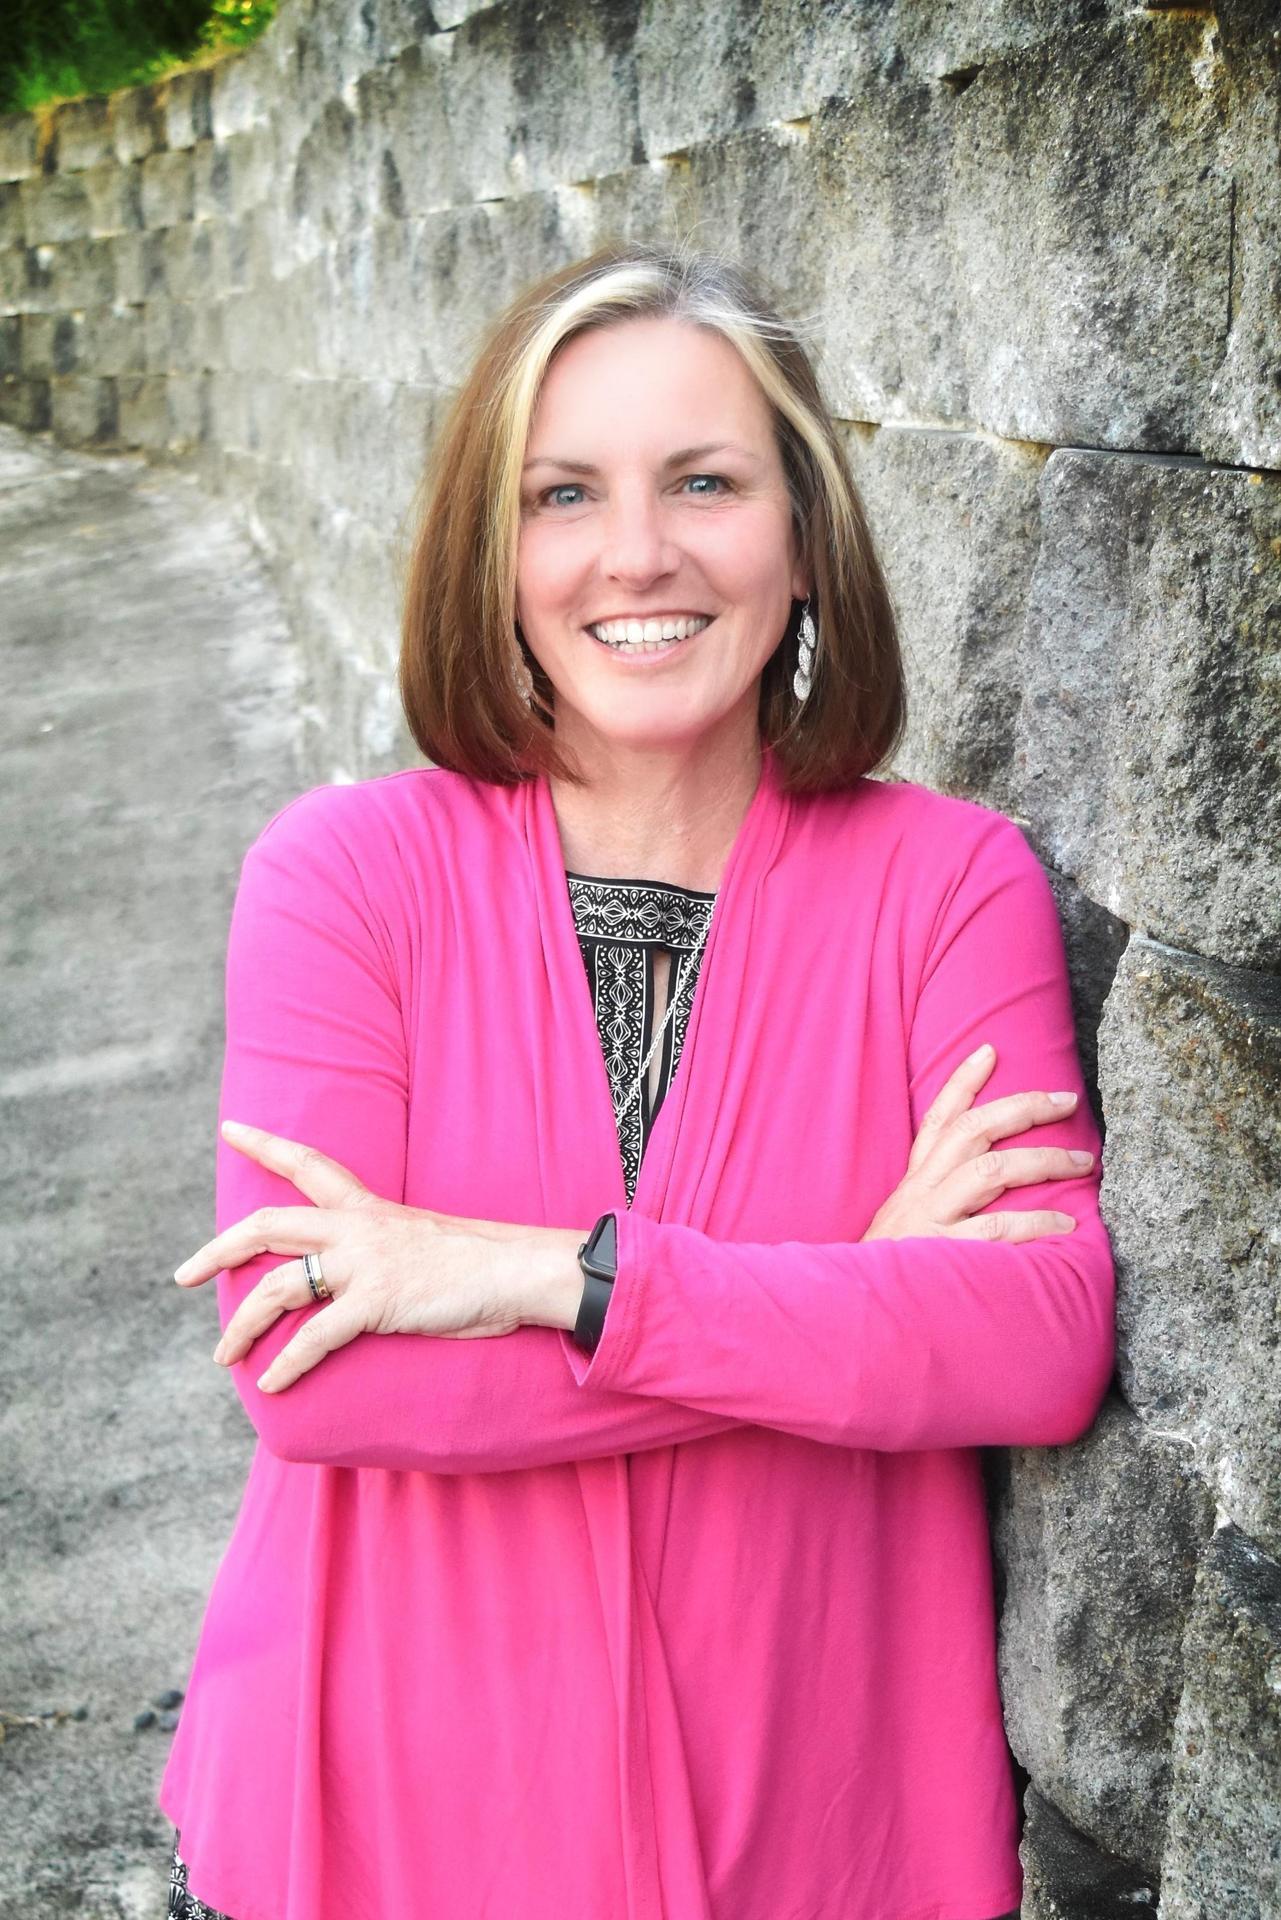 Amy Hollinger - Head of Schools - Rolling Hills Prep, Renaissance, and REACH Schools